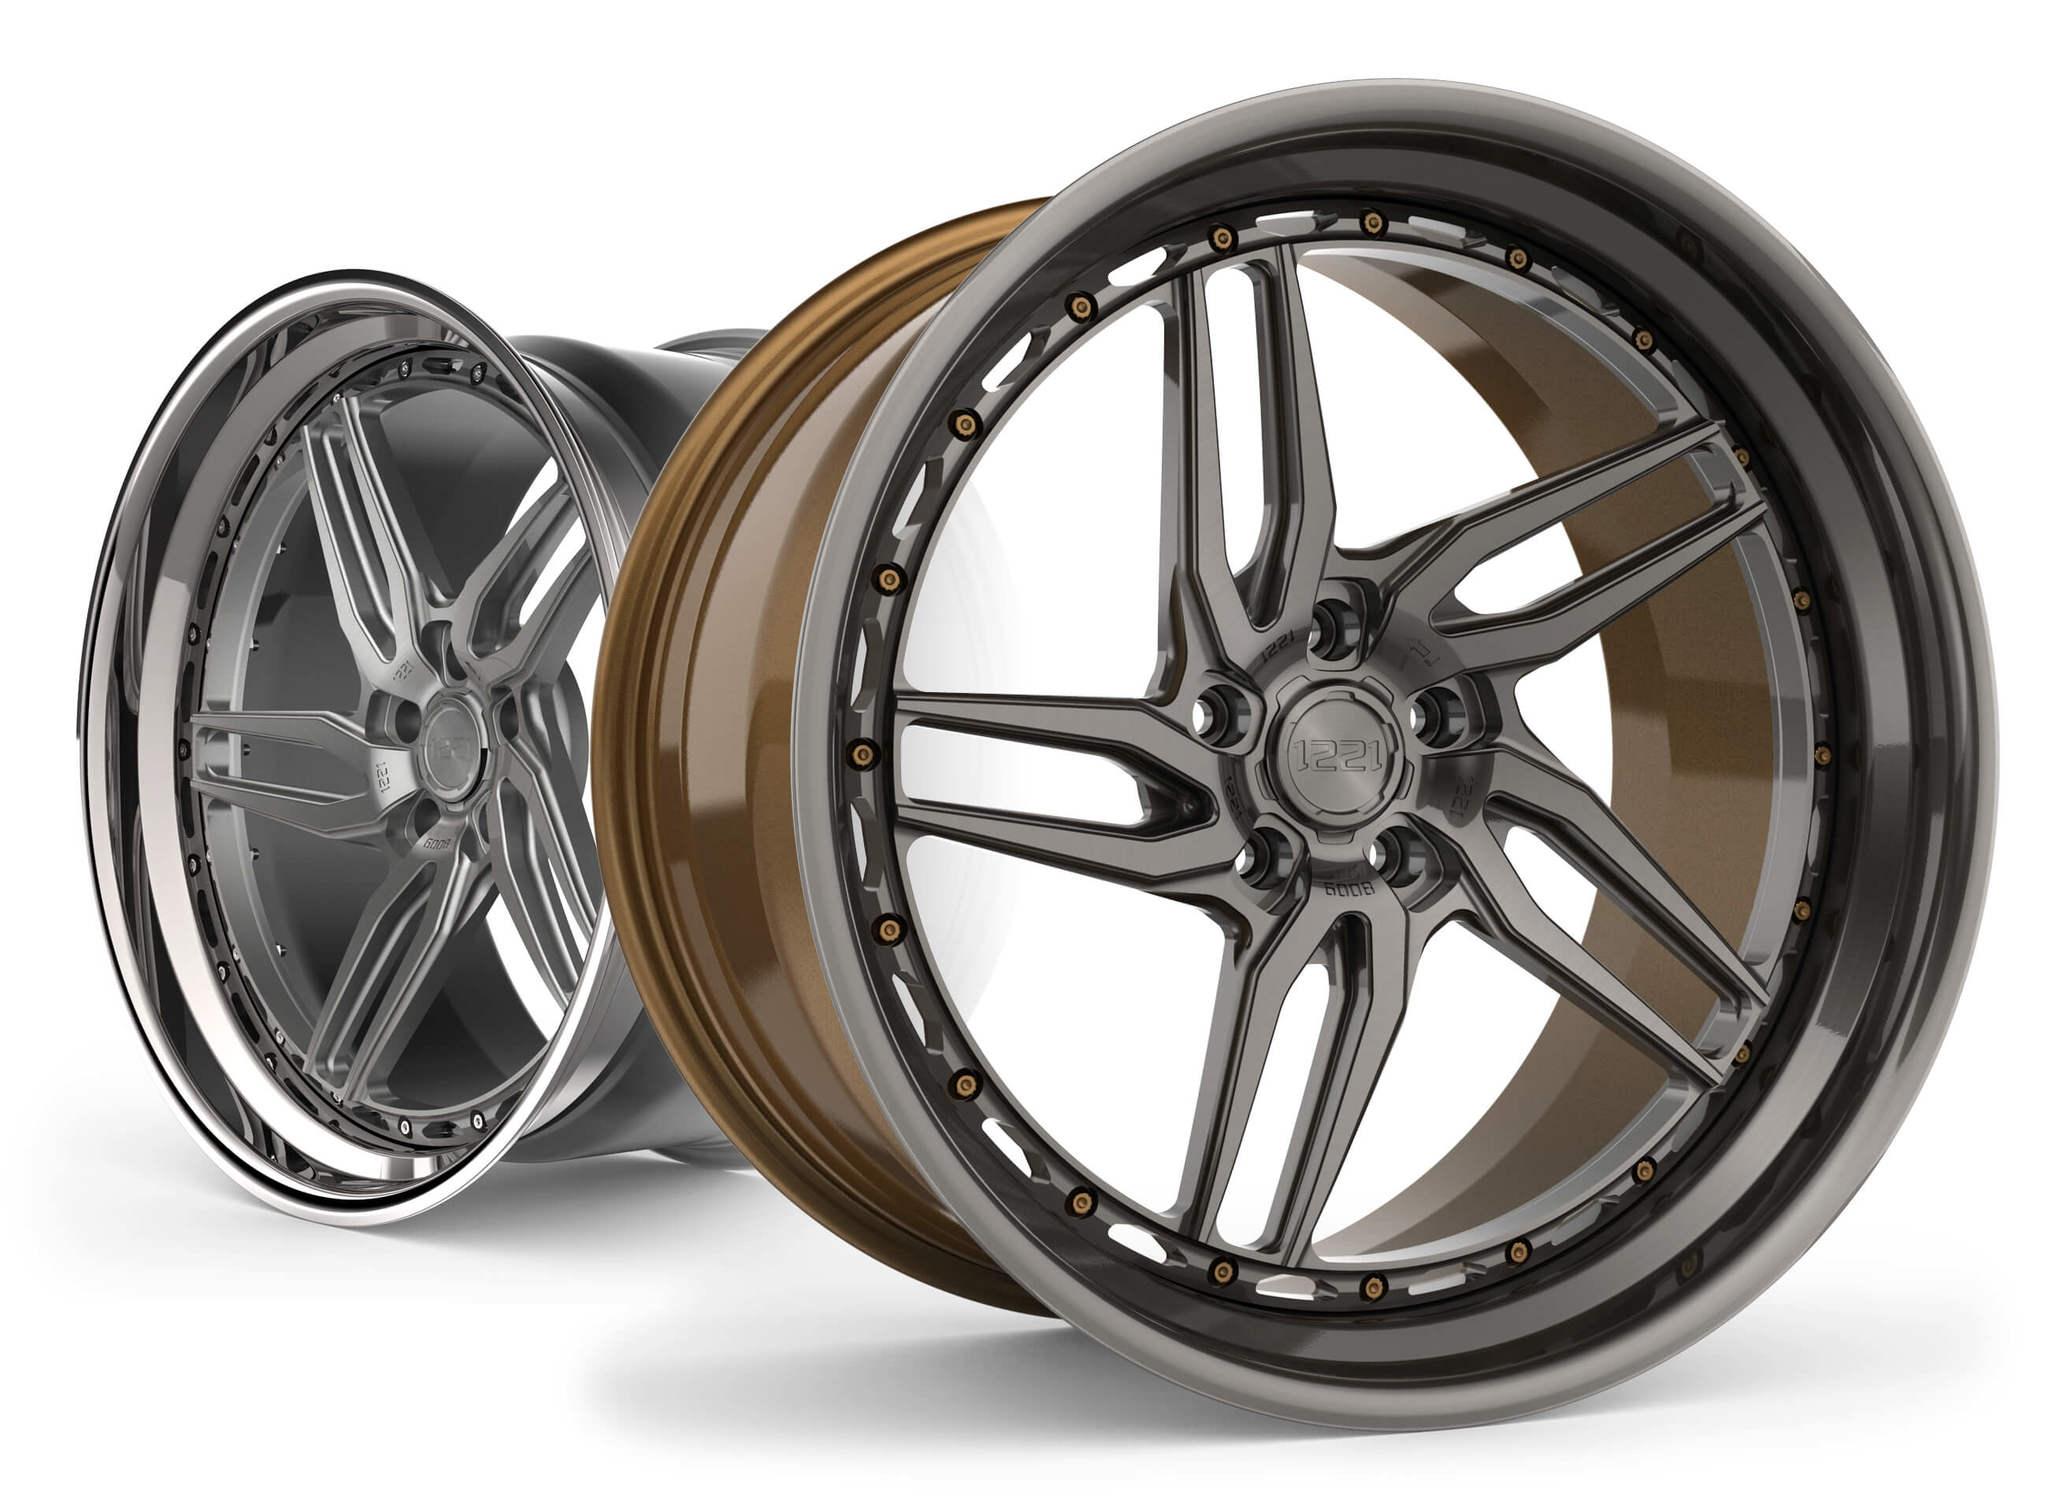 1221  Wheels  R6008 AP3X APEX3.0 forged wheels